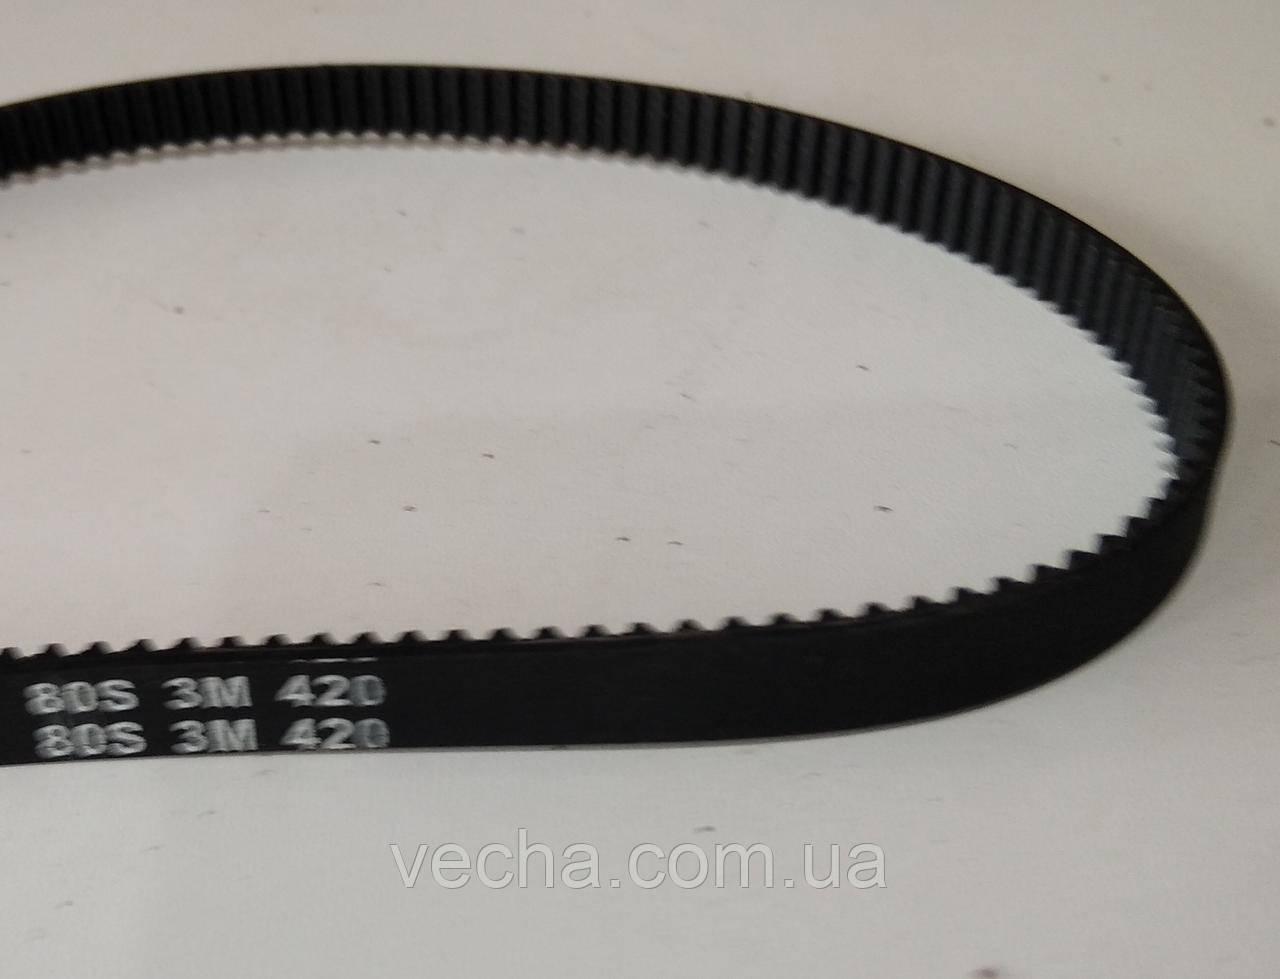 Ремень зубчатый S3М-420 для хлебопечки, фото 3